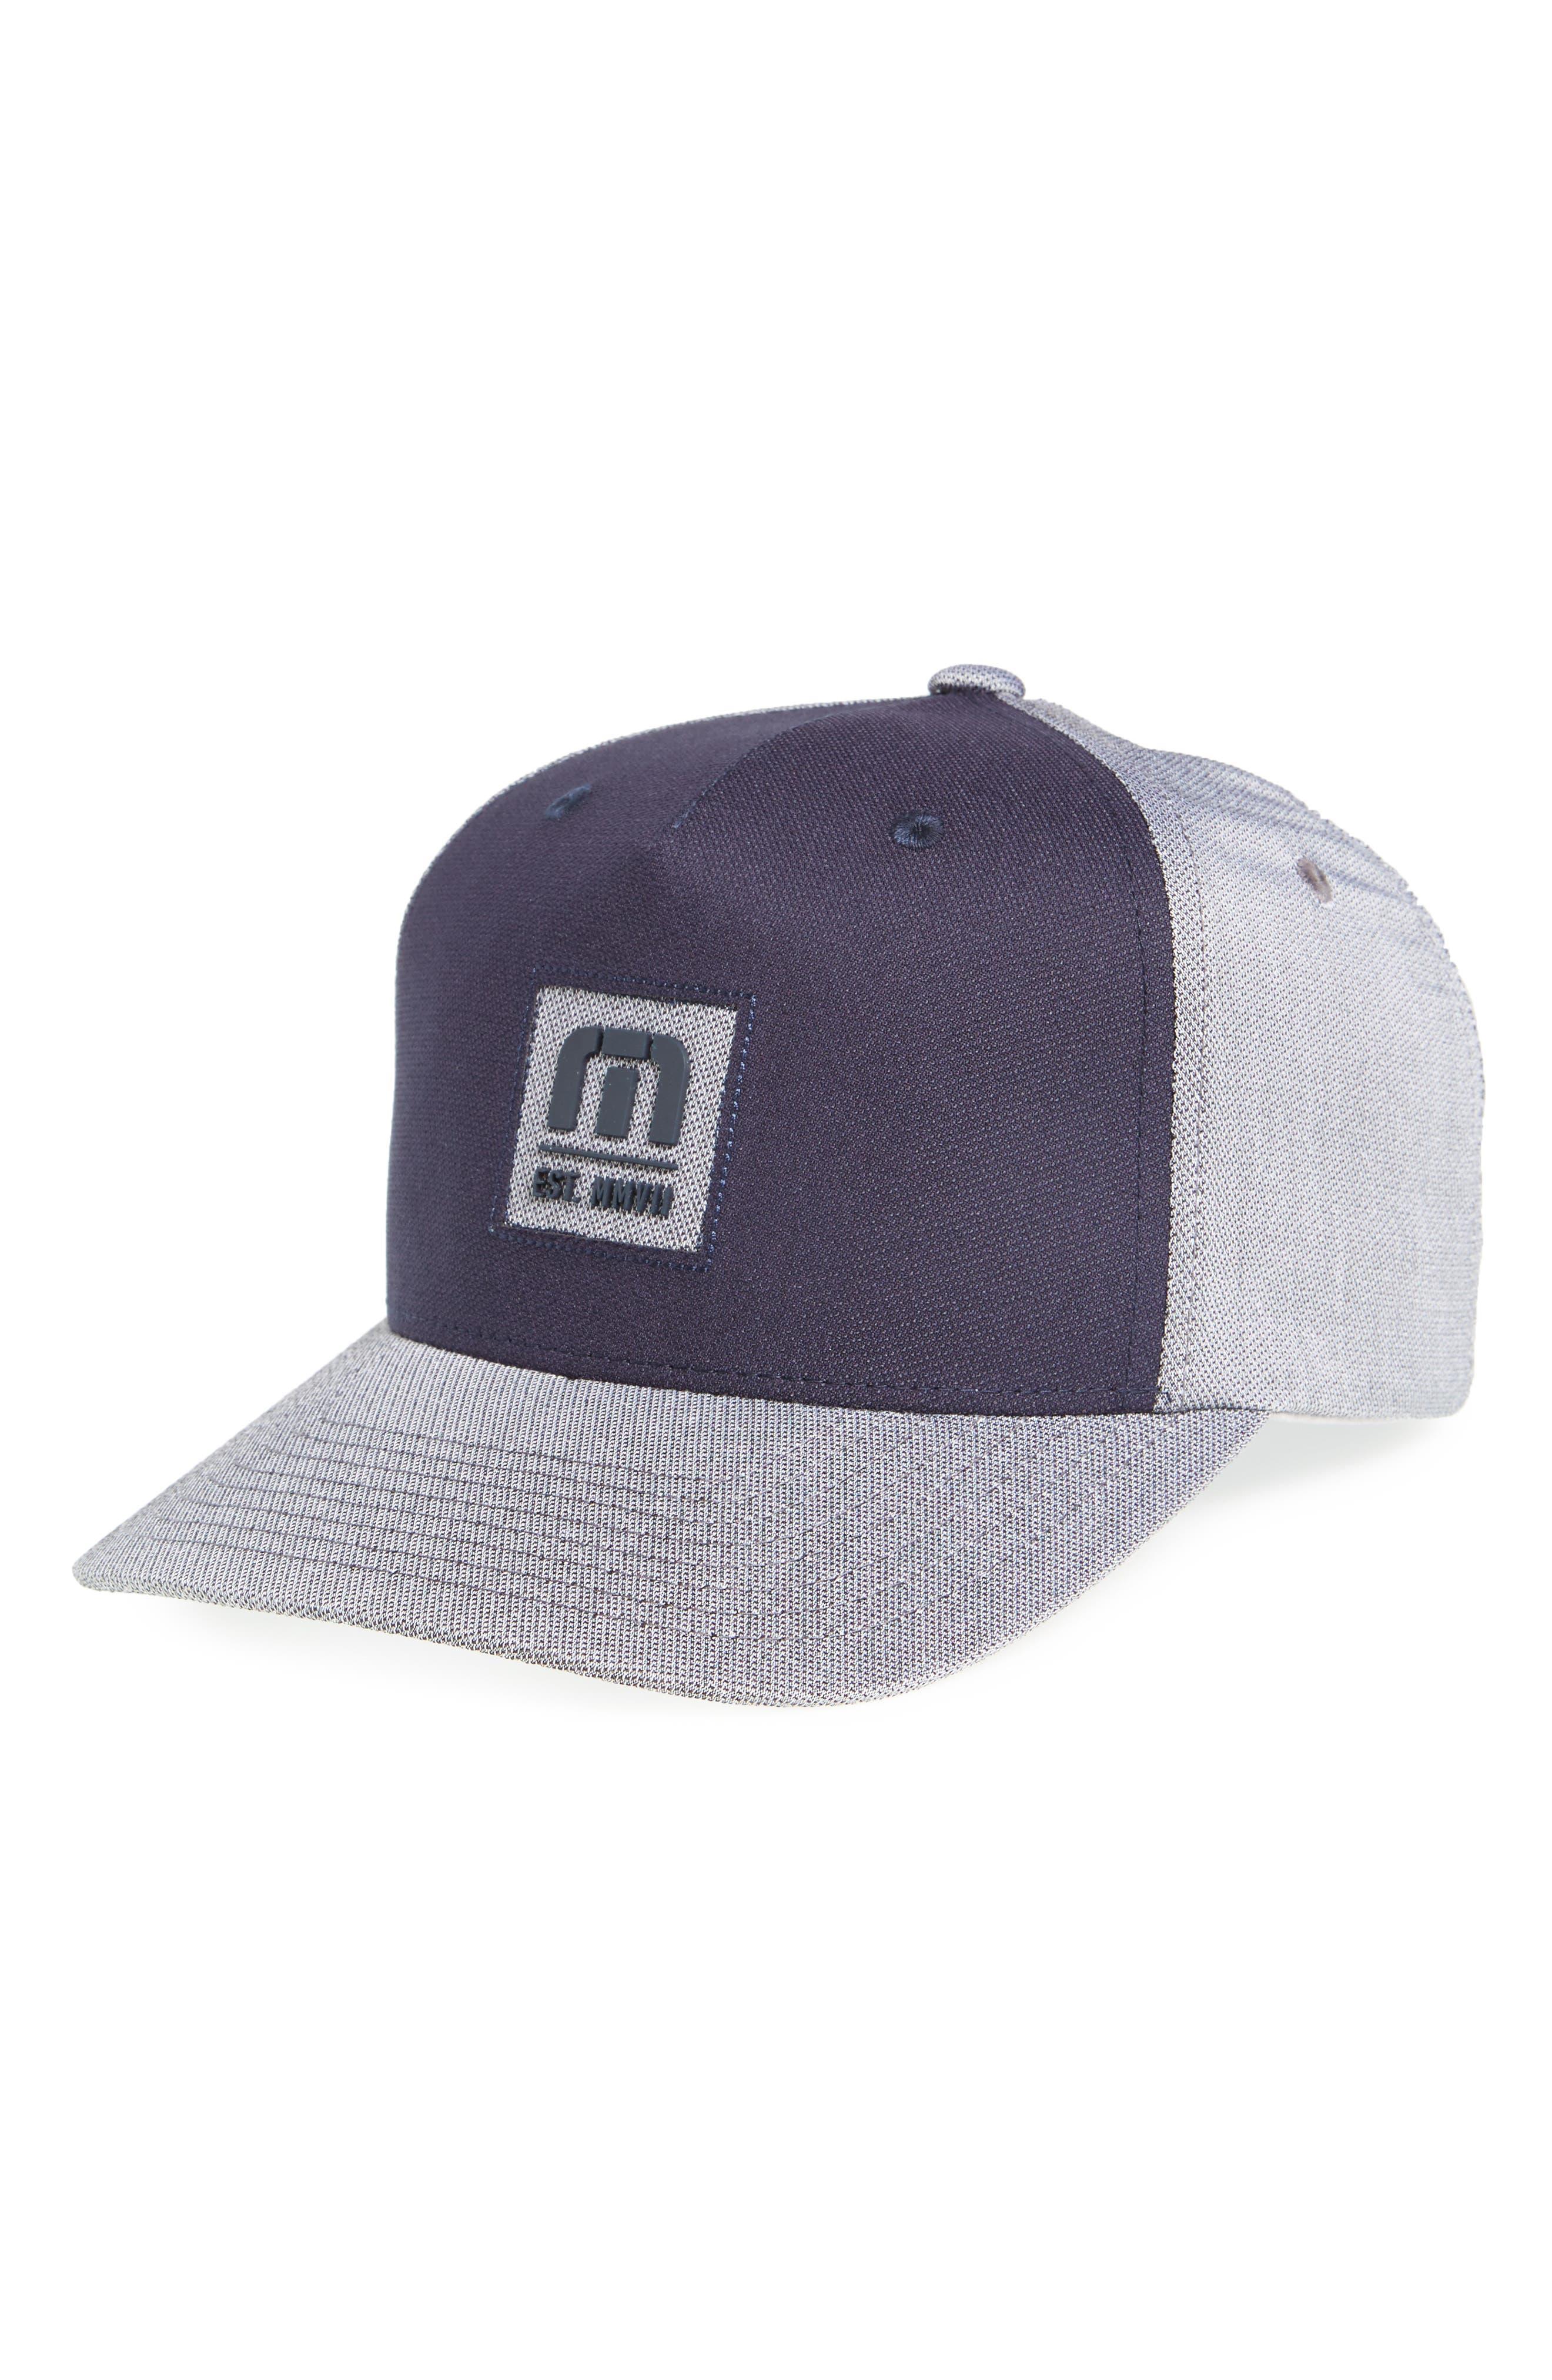 low priced b7a90 0b85d ... coupon code for travis mathew paul flex fit baseball cap 520b7 6f68a